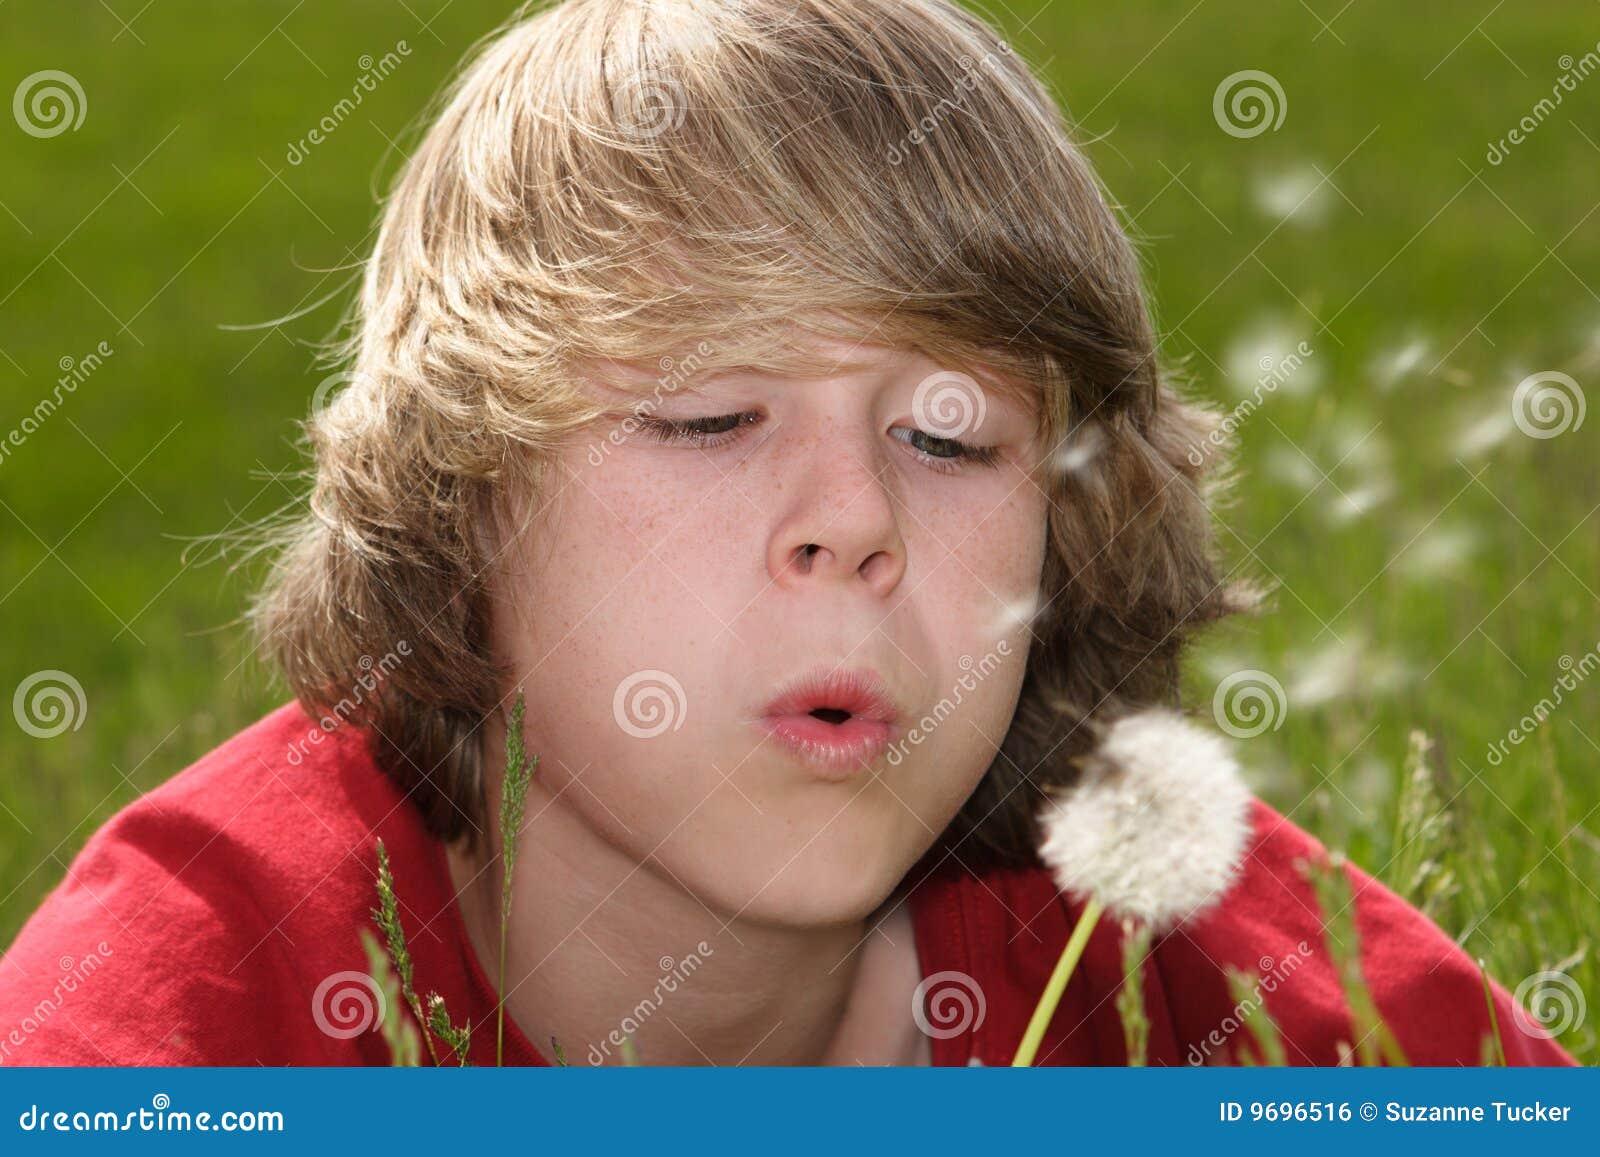 teenboy Teen boy blowing dandelion seeds Royalty Free Stock Image